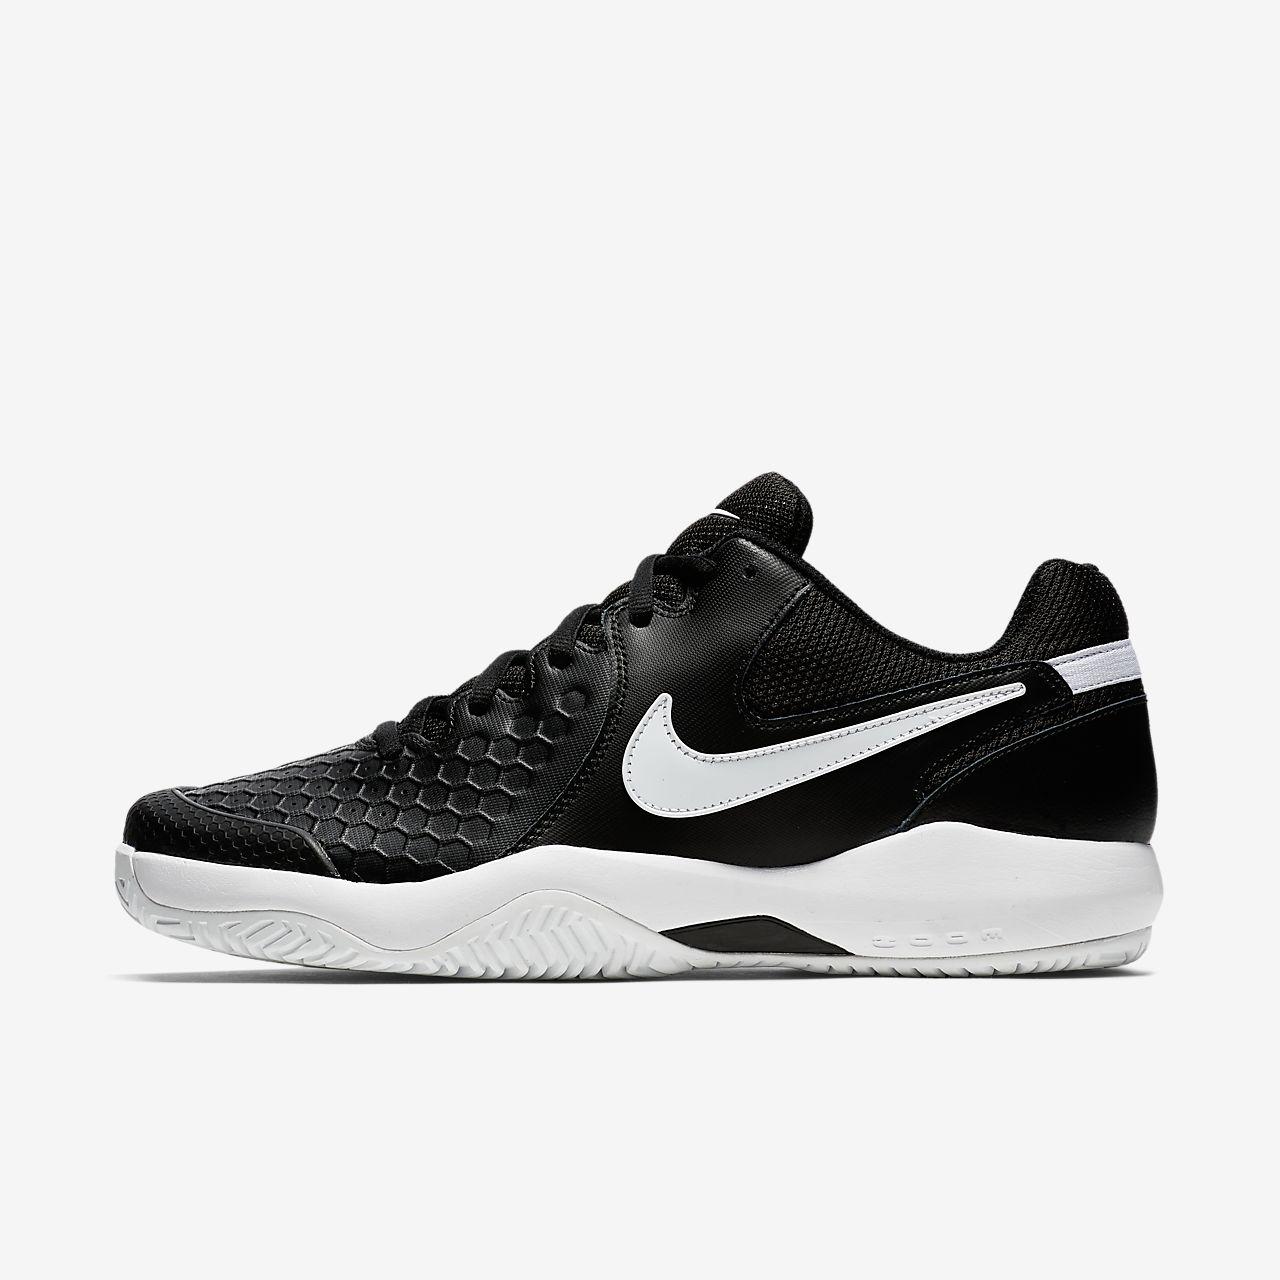 6cef62a7e2cc8 ... NikeCourt Air Zoom Resistance Zapatillas de tenis de pista rápida -  Hombre